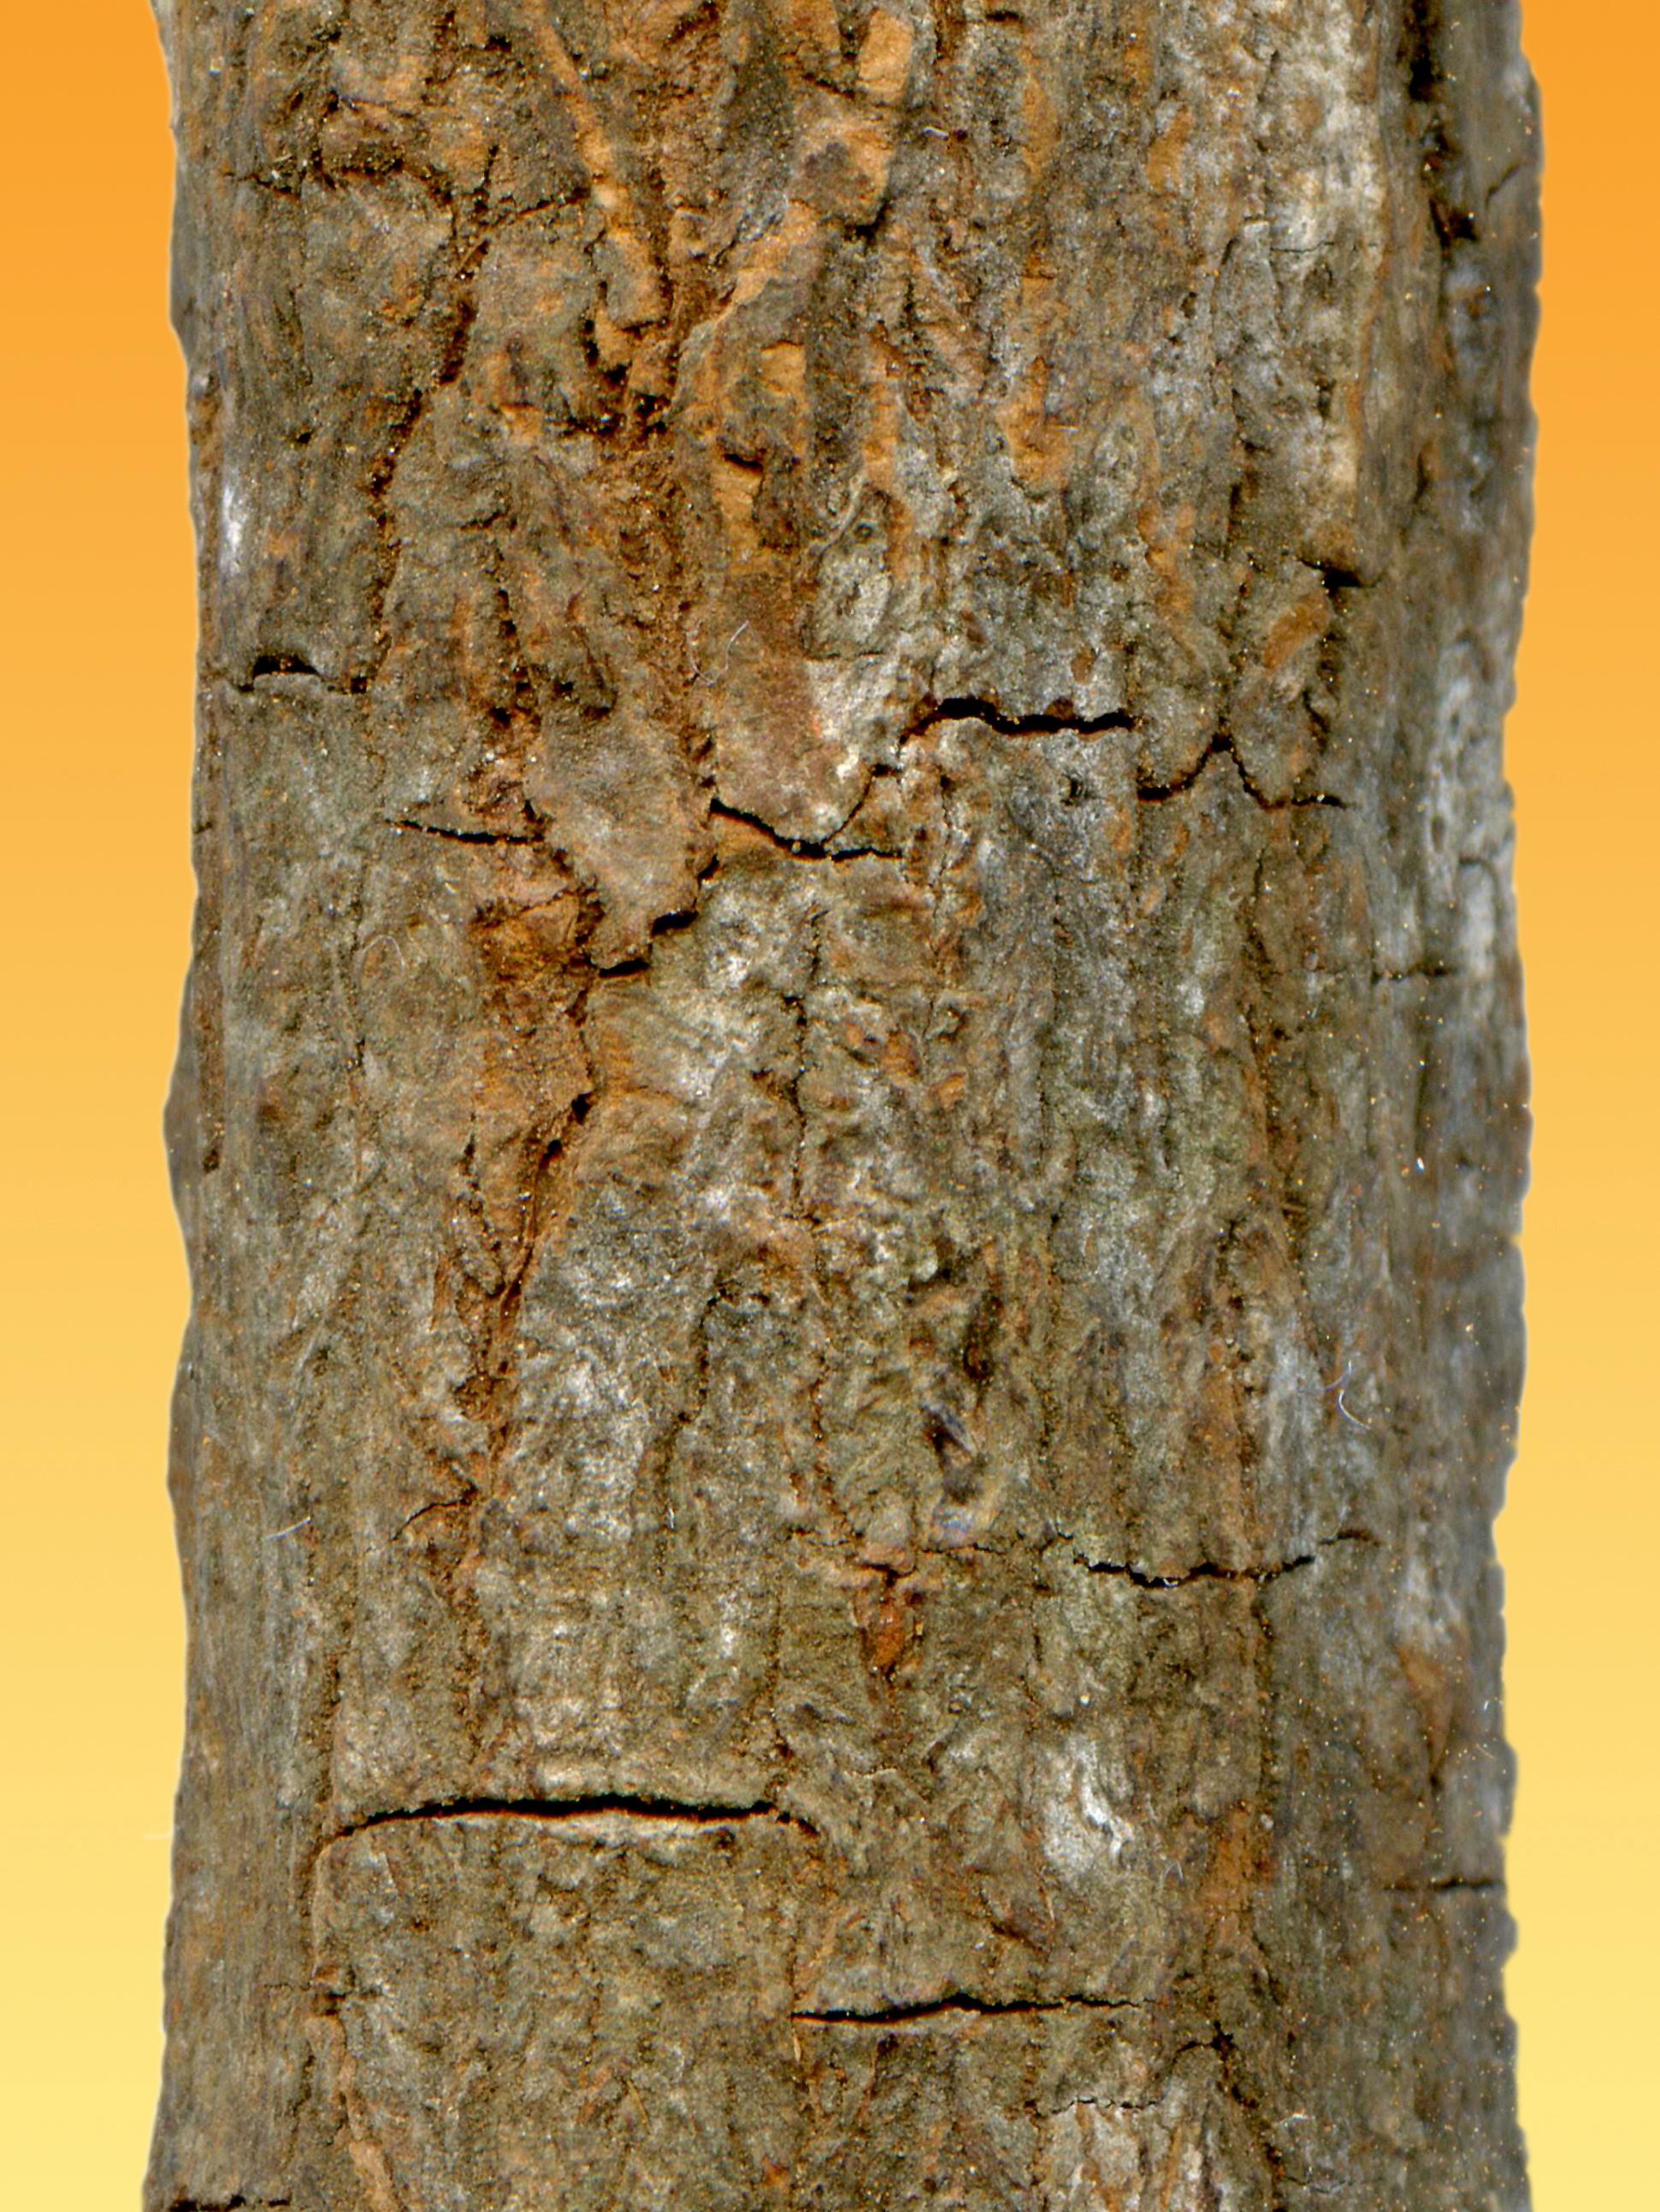 File:Cinchona officinalis 002.JPG - Wikimedia Commons